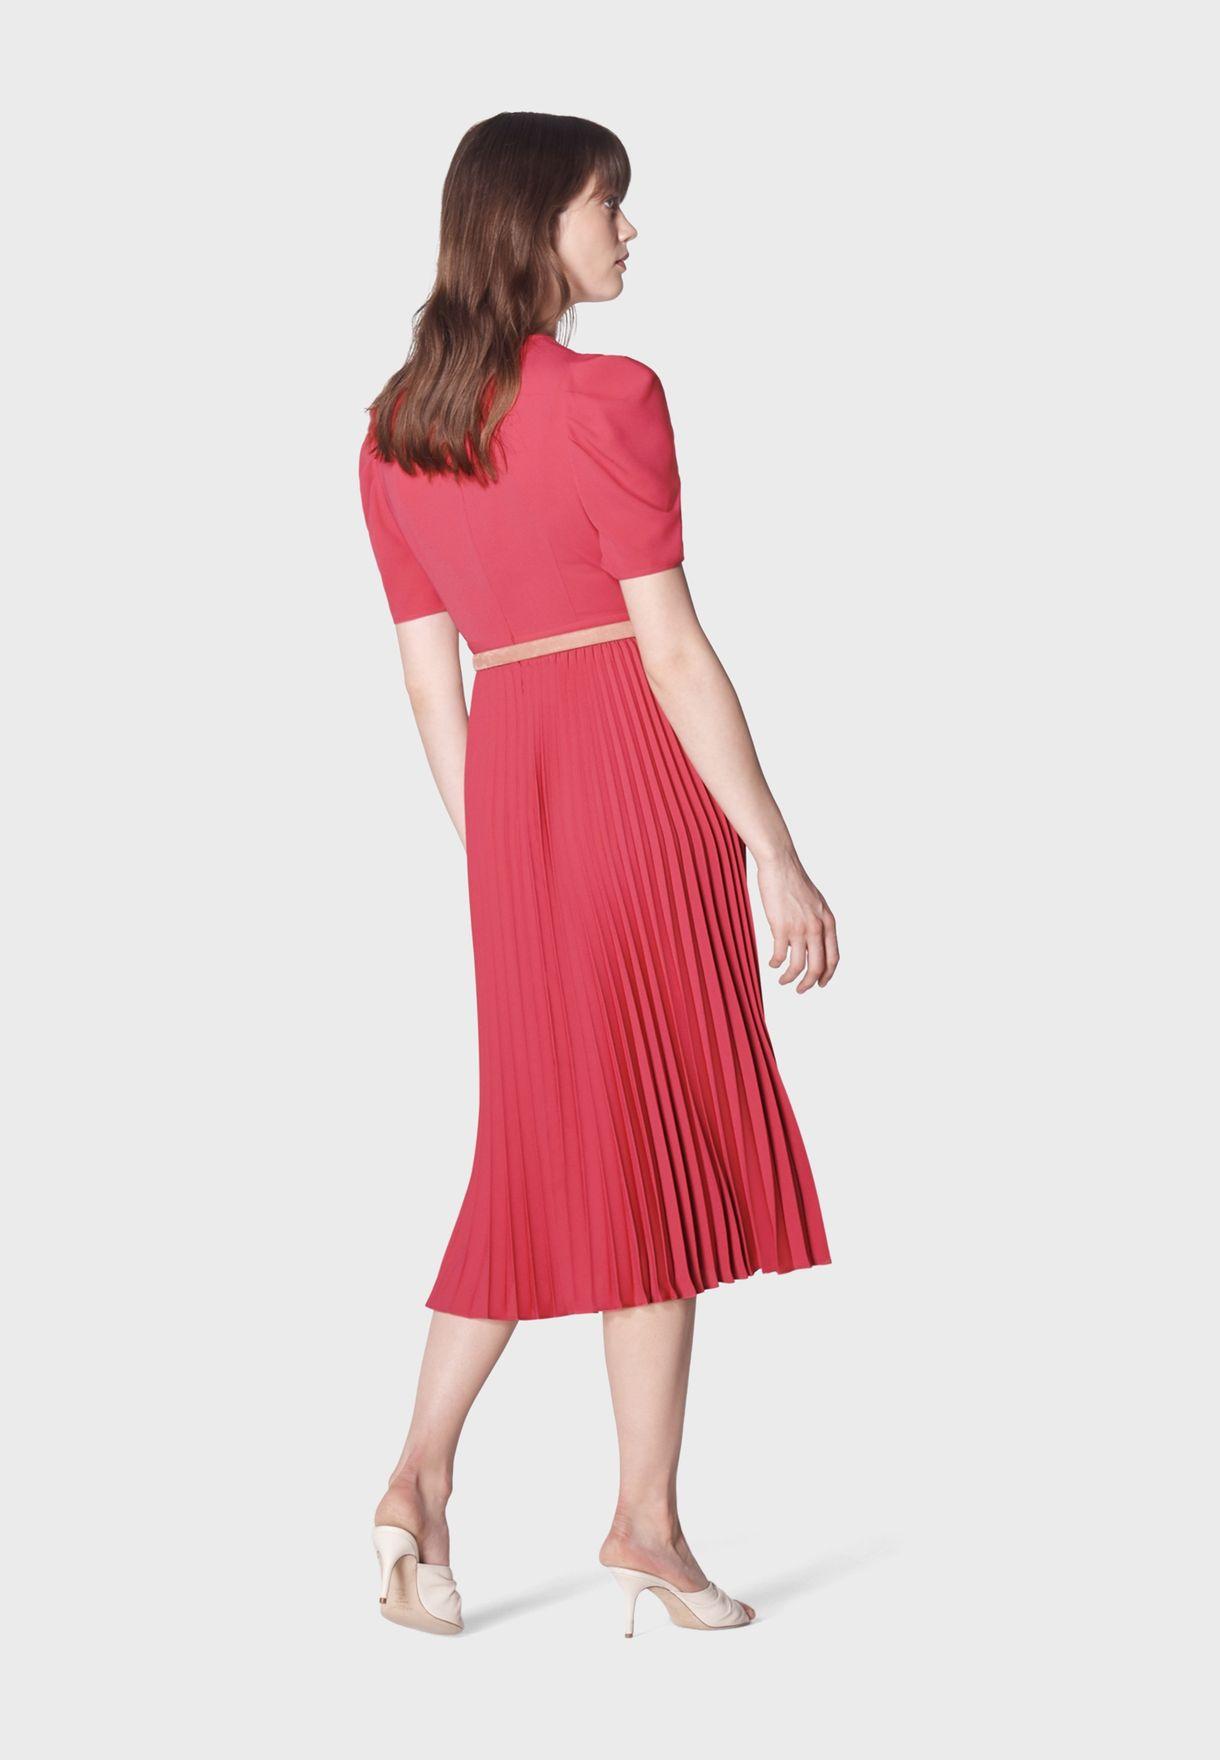 Dr Avalon Pilise Shift Dress